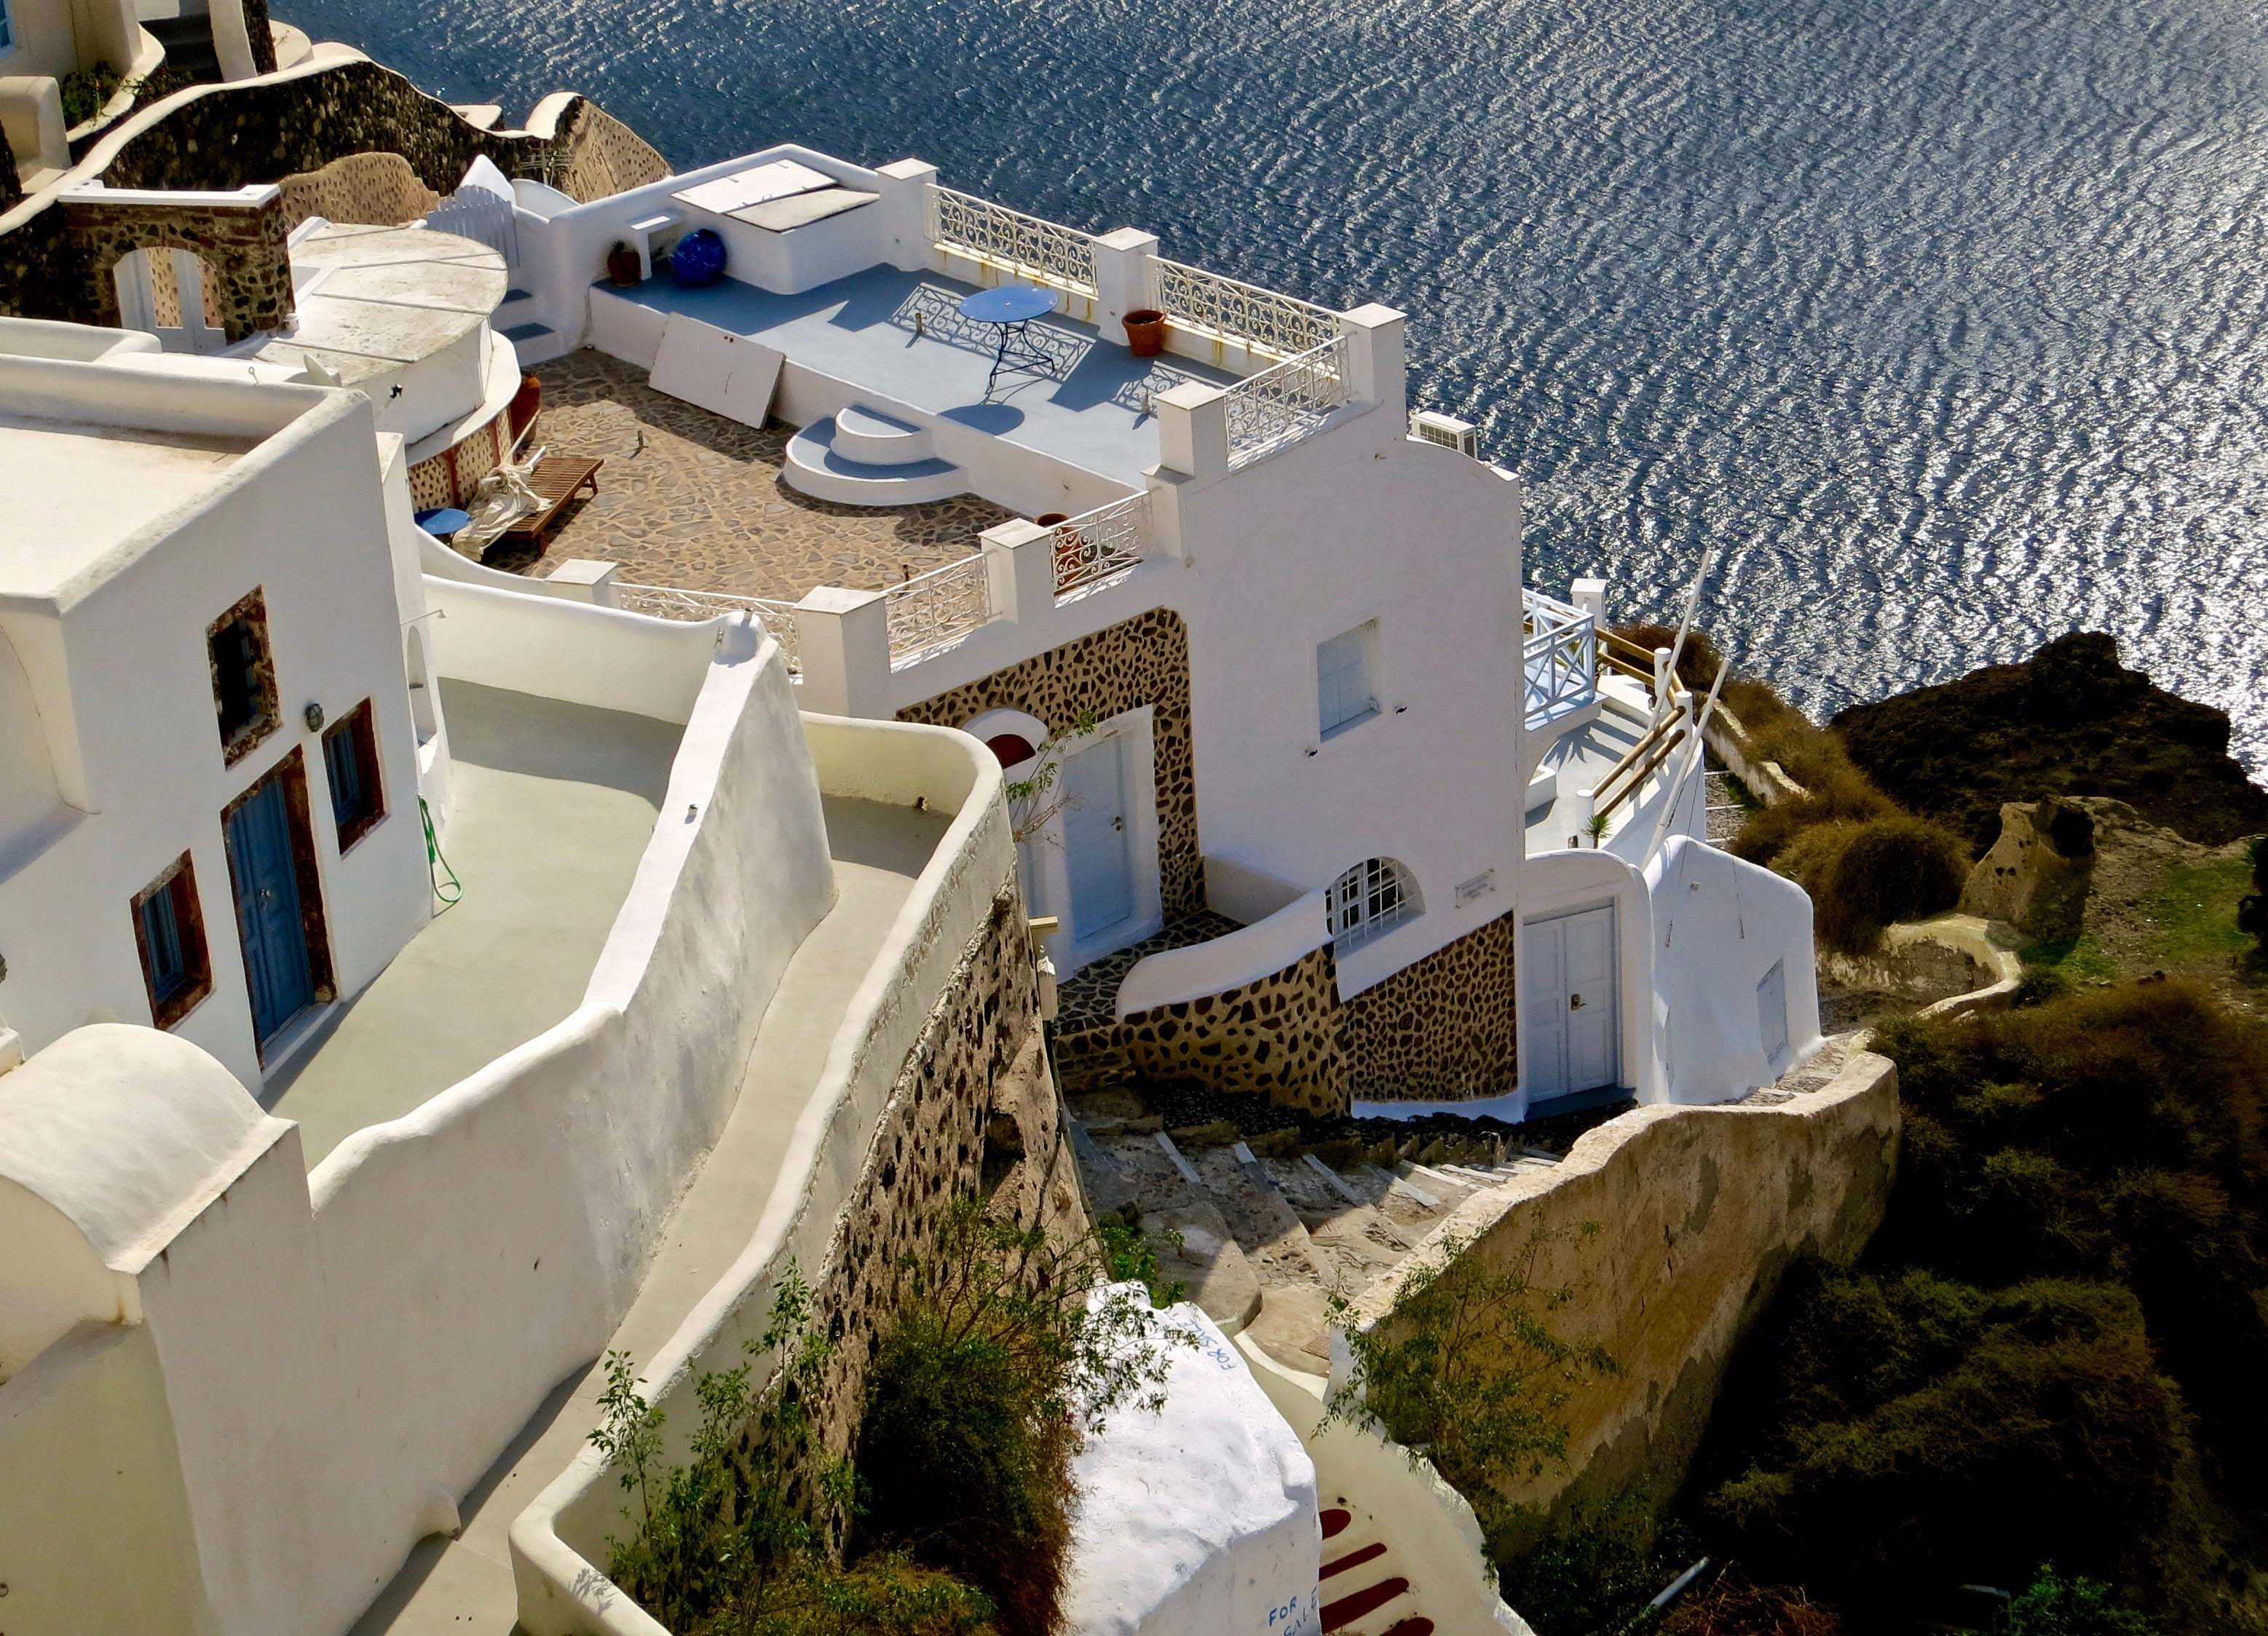 Santorini photo by Curtis Mekemson.